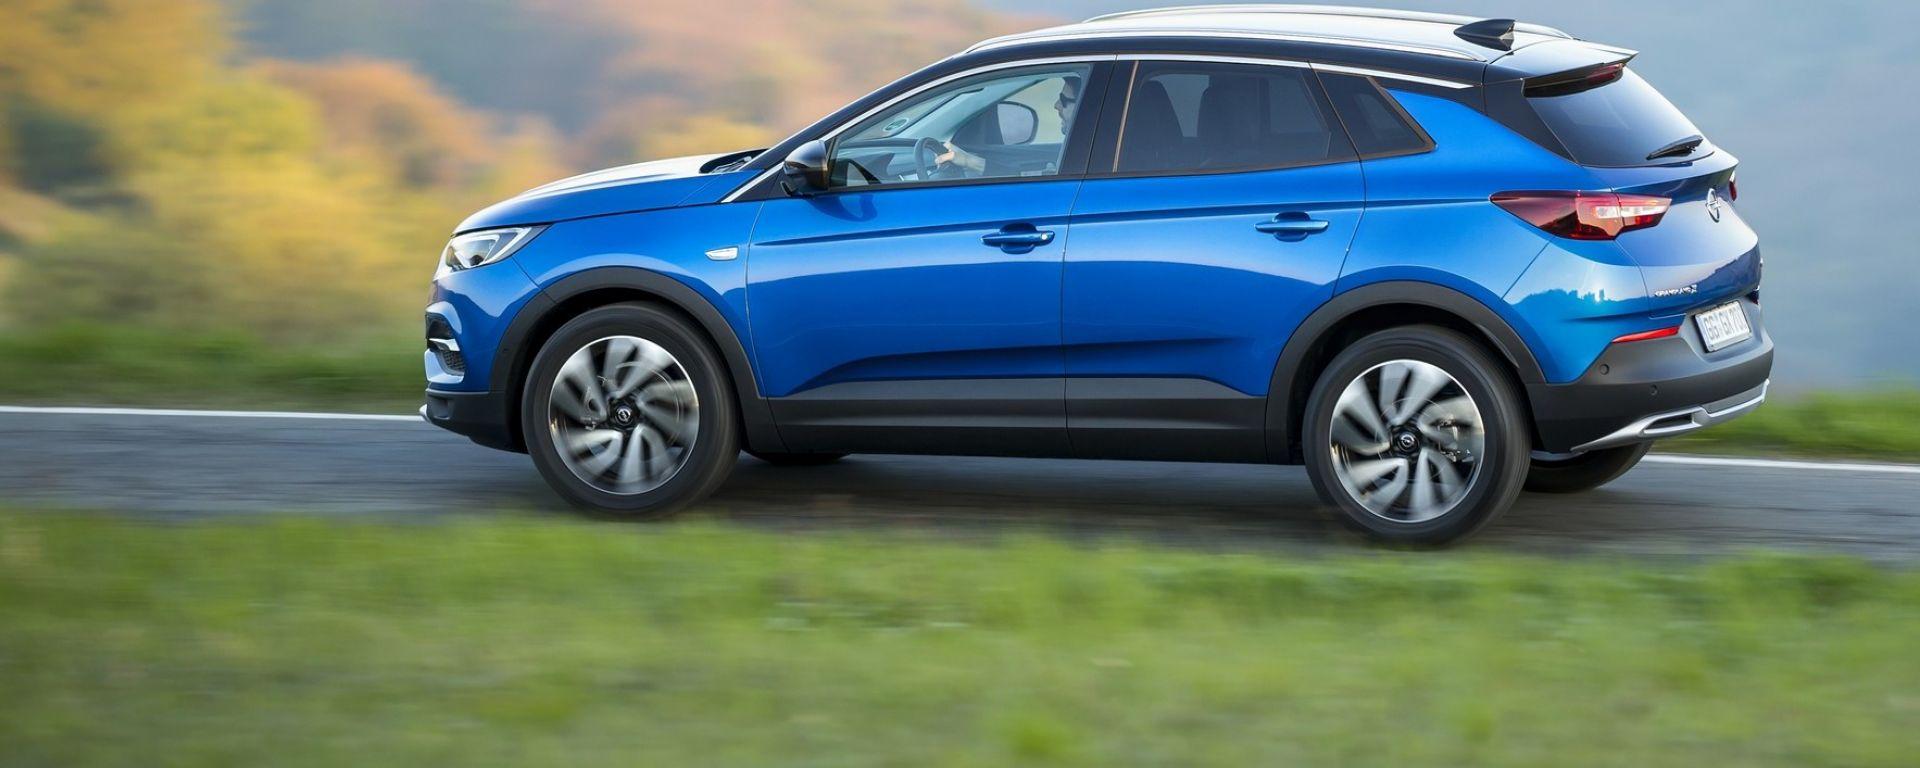 Opel Grandland X, dal 2019 anche ibrido plug-in